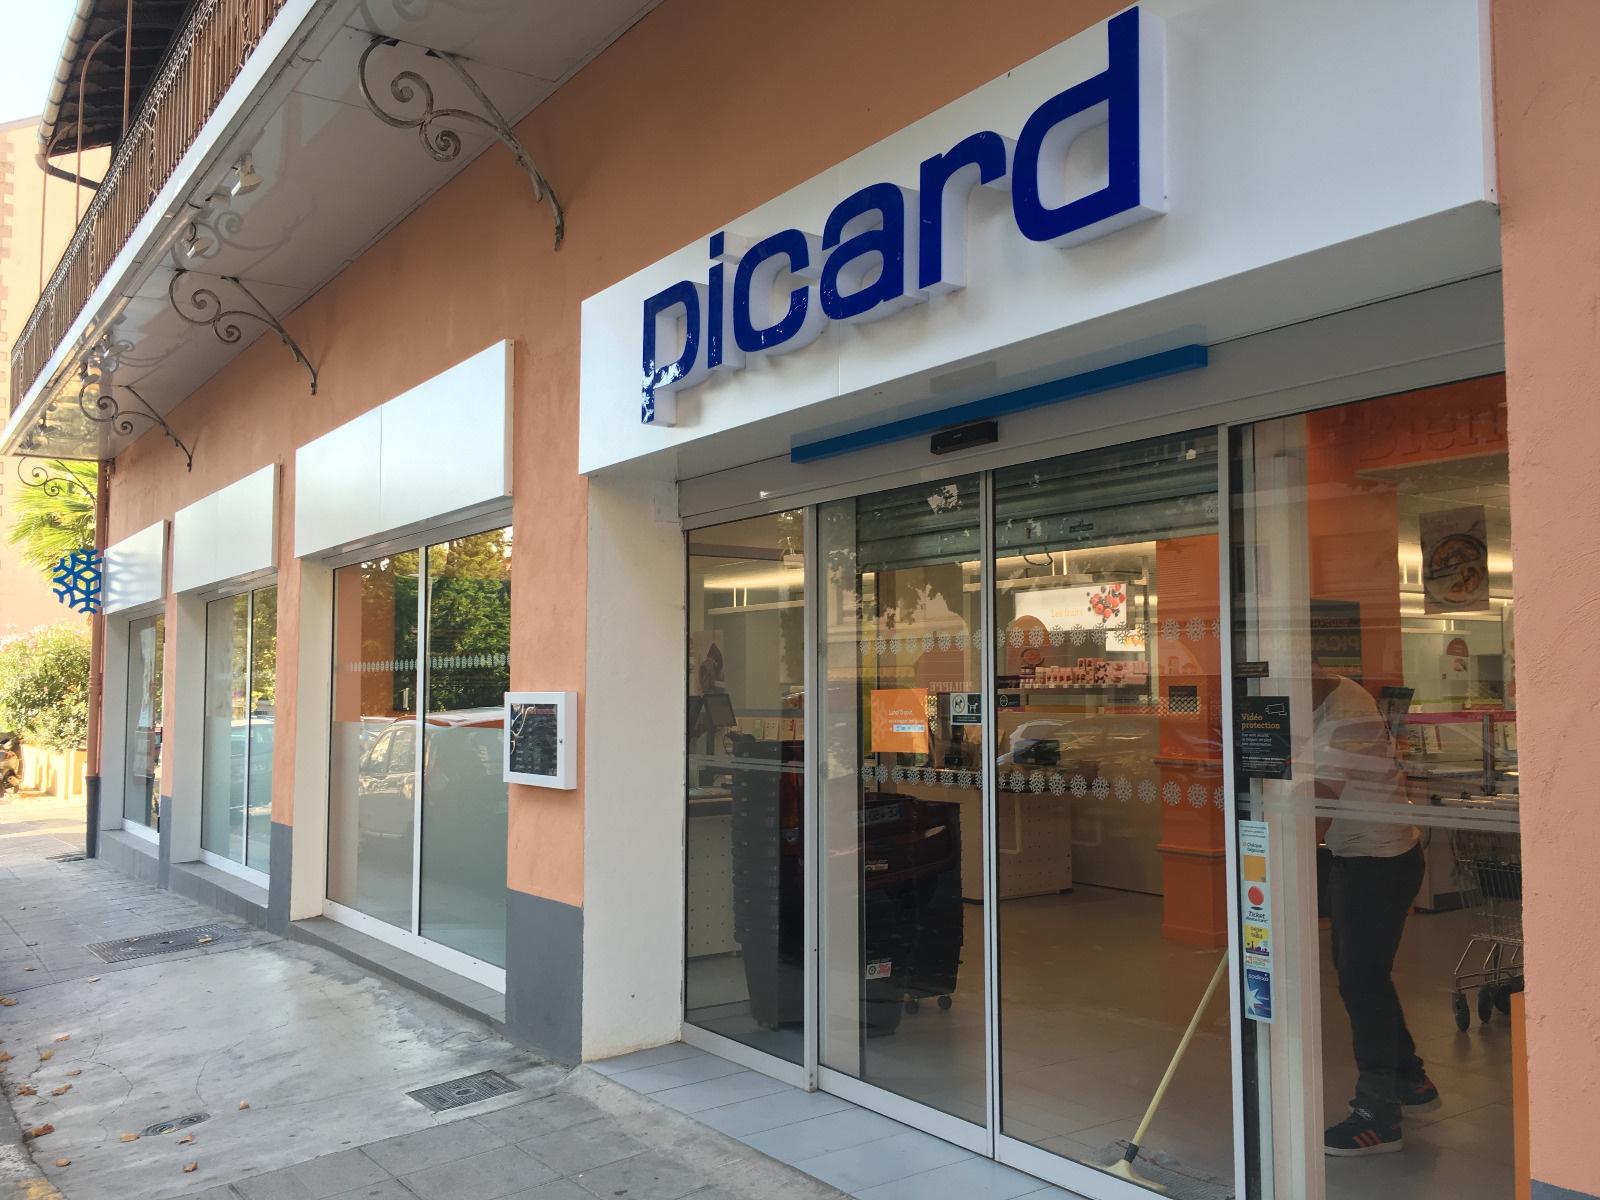 Vente immobilier professionnel insatallation de picard for Garage boulevard de la madeleine nice